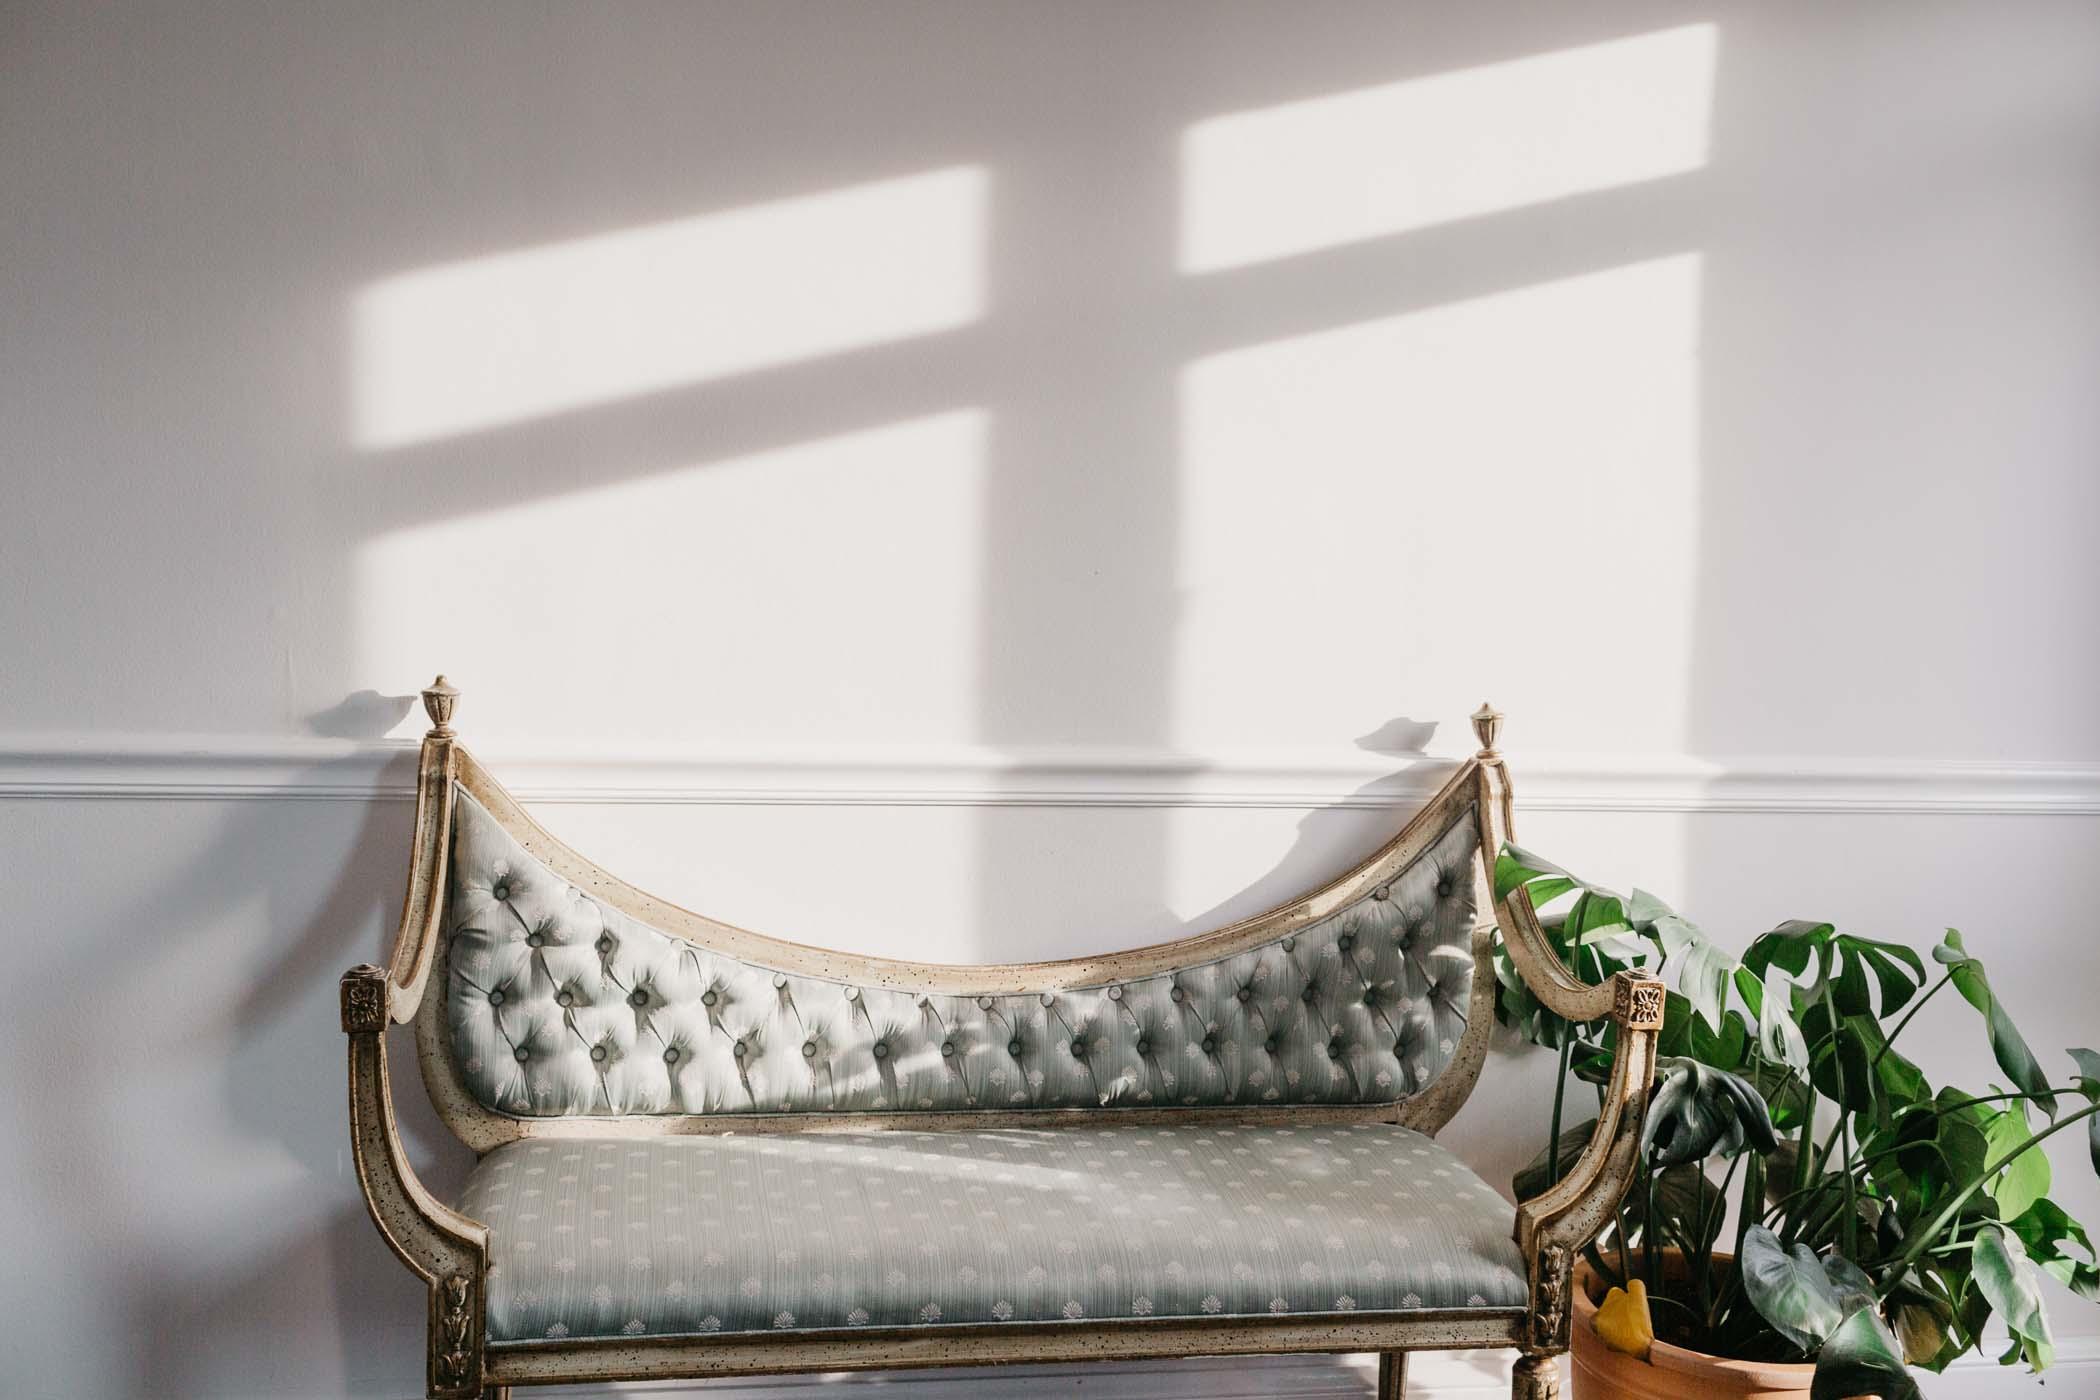 cozy-casa-nashville-tn-natural-light-studio-photography-ideas-lifestyle-photographer-photography-18.jpg